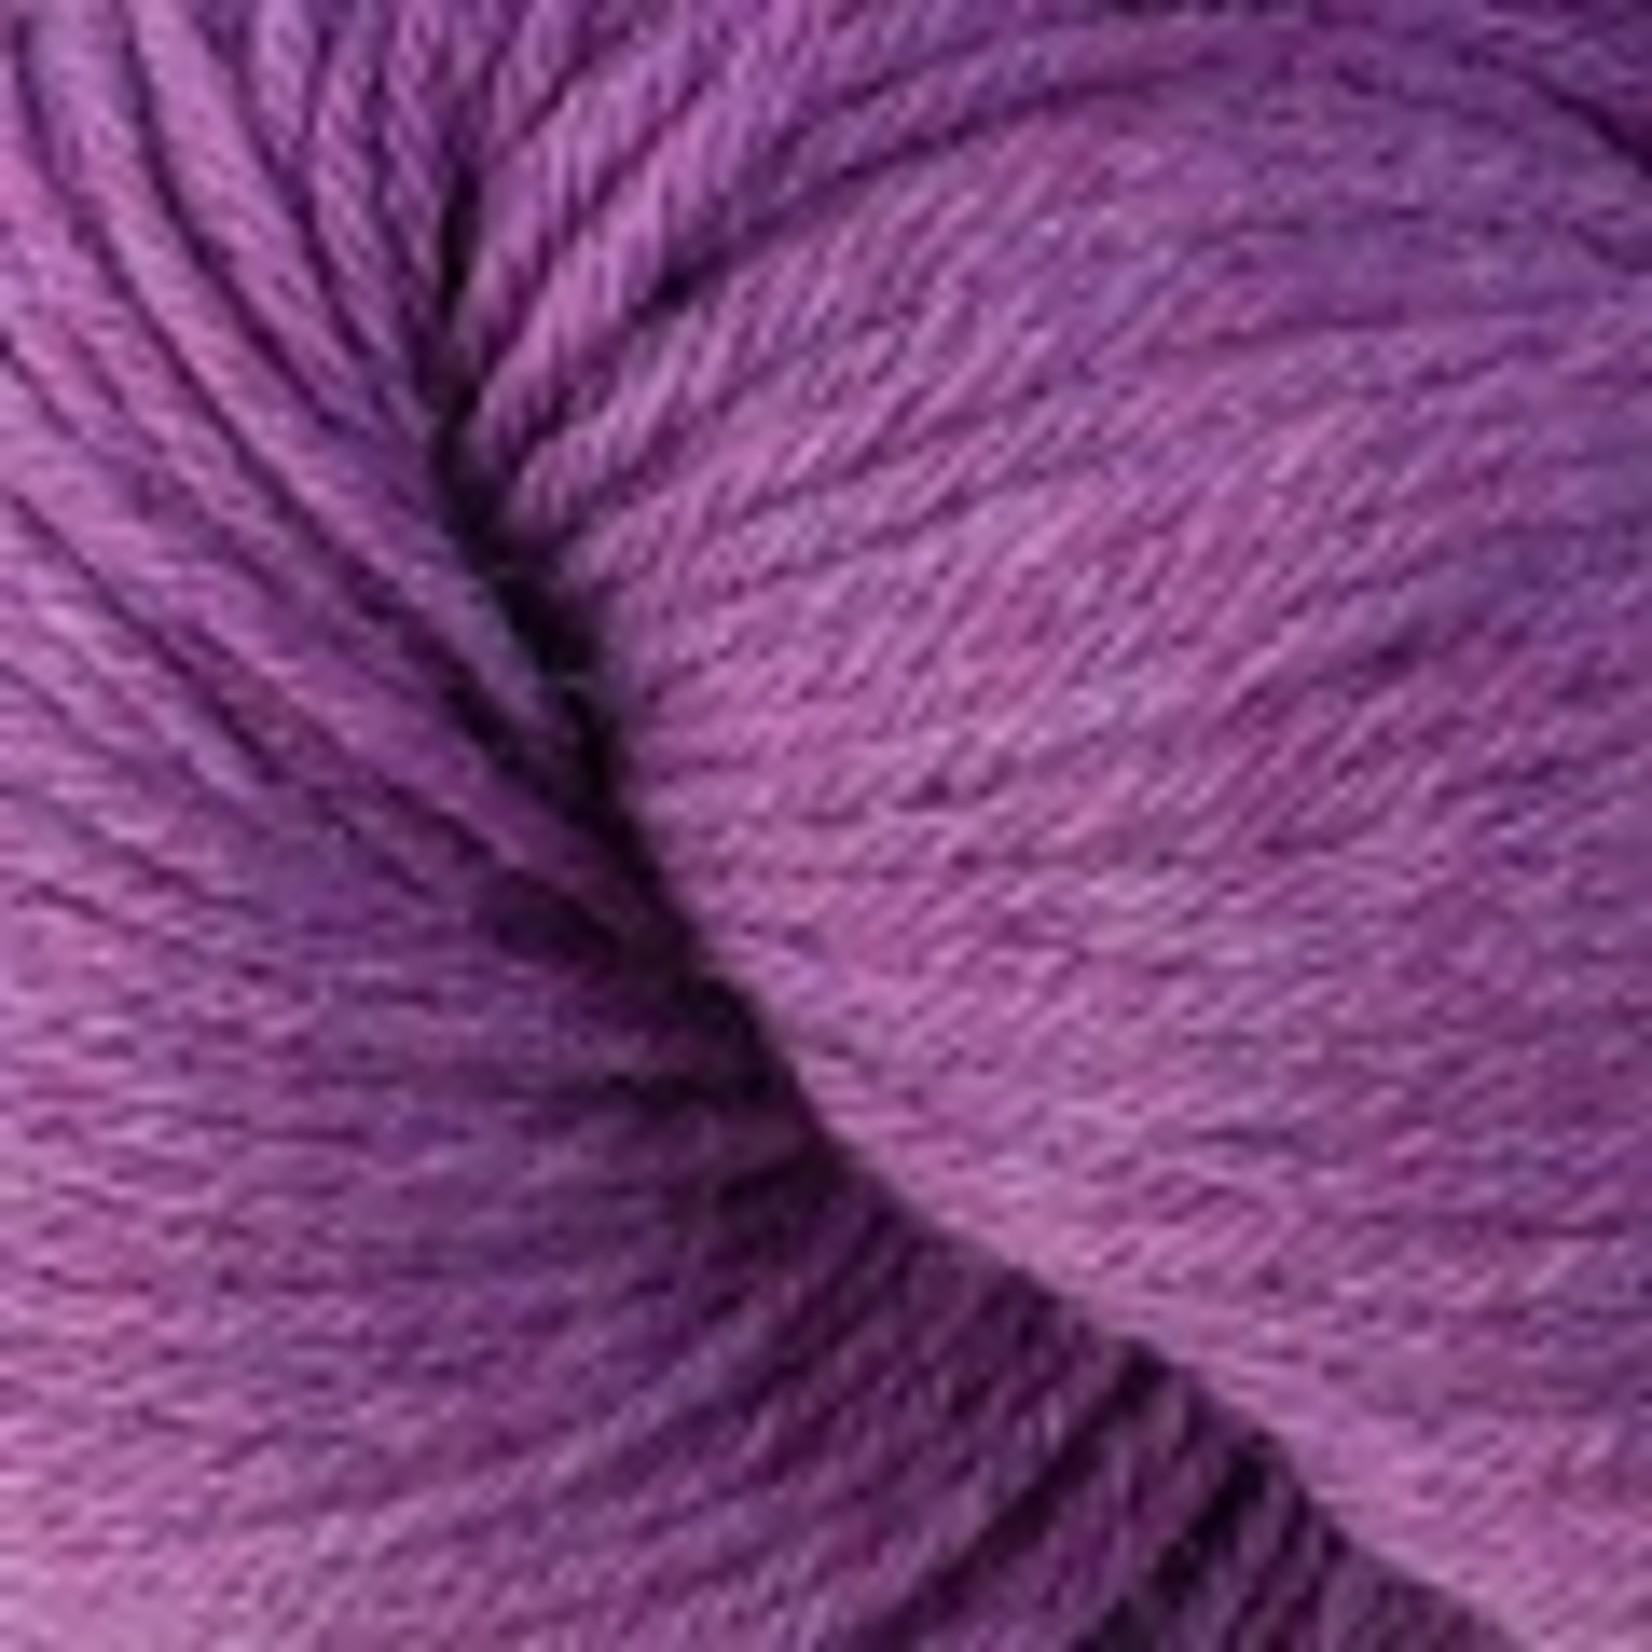 Berroco Vintage Wool, 51176, Fuchsia